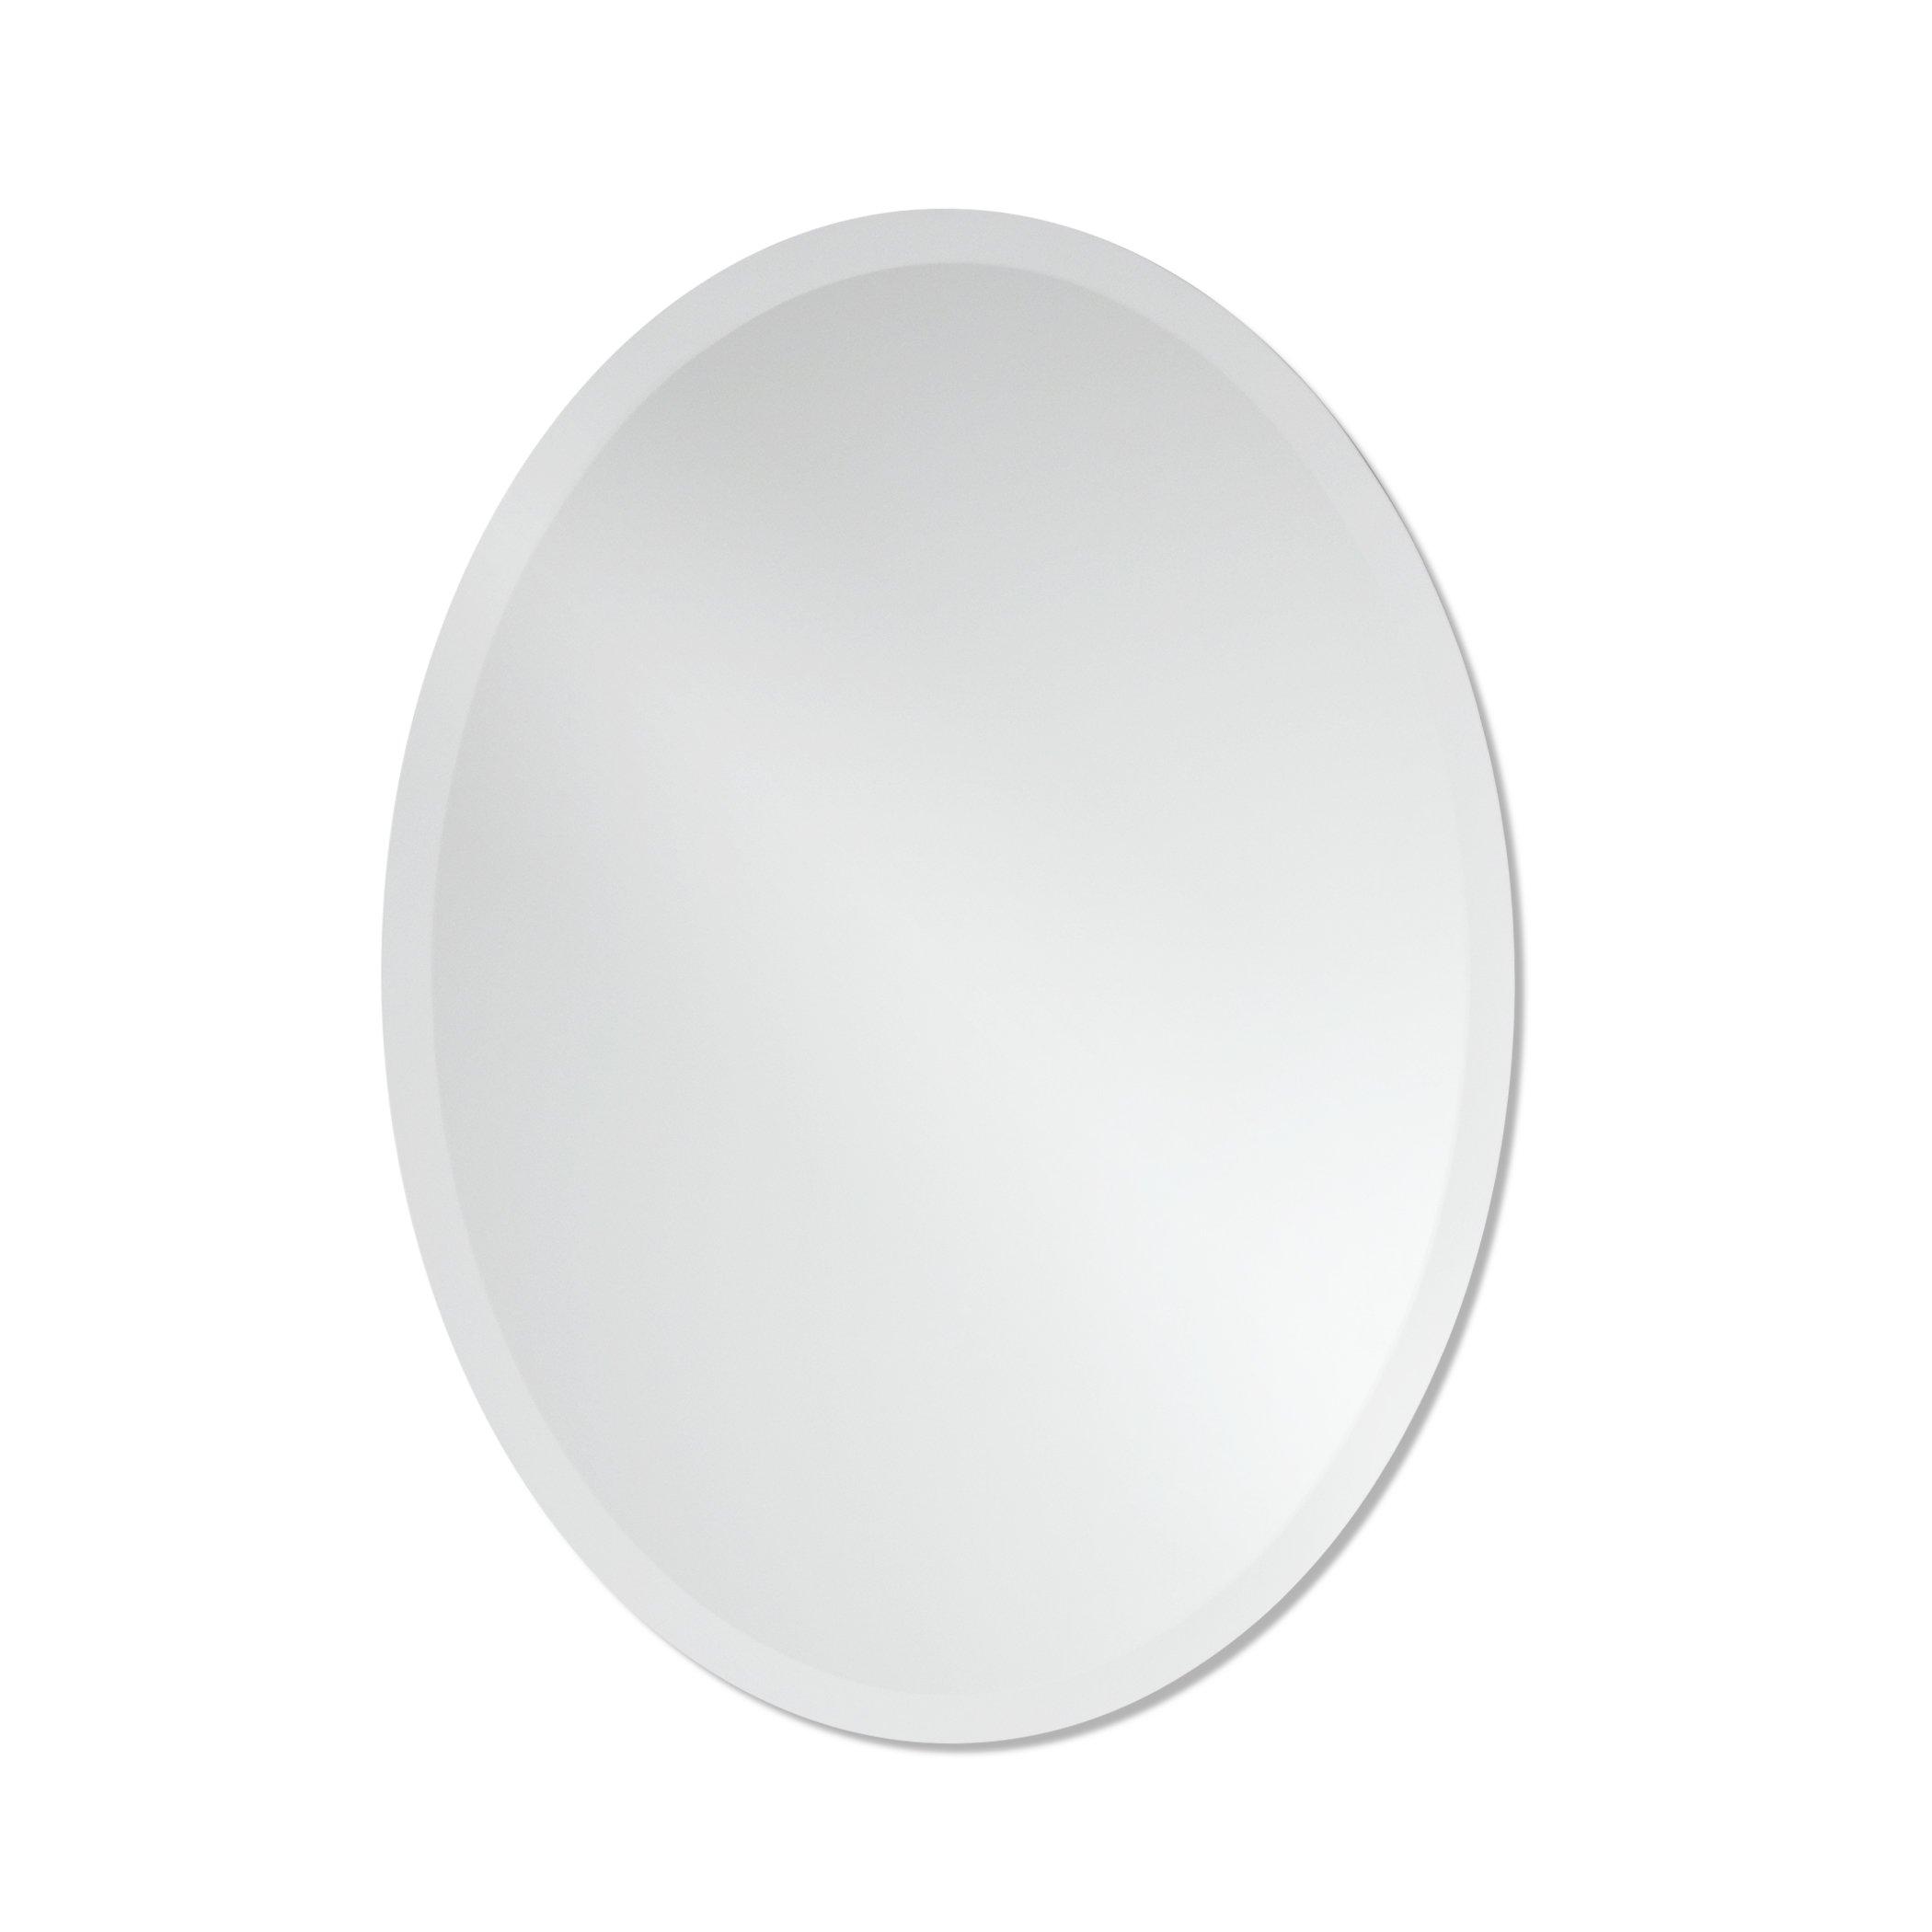 Small Frameless Beveled Oval Wall Mirror | Bathroom, Vanity, Bedroom Mirror | 20-inch x 27-inch